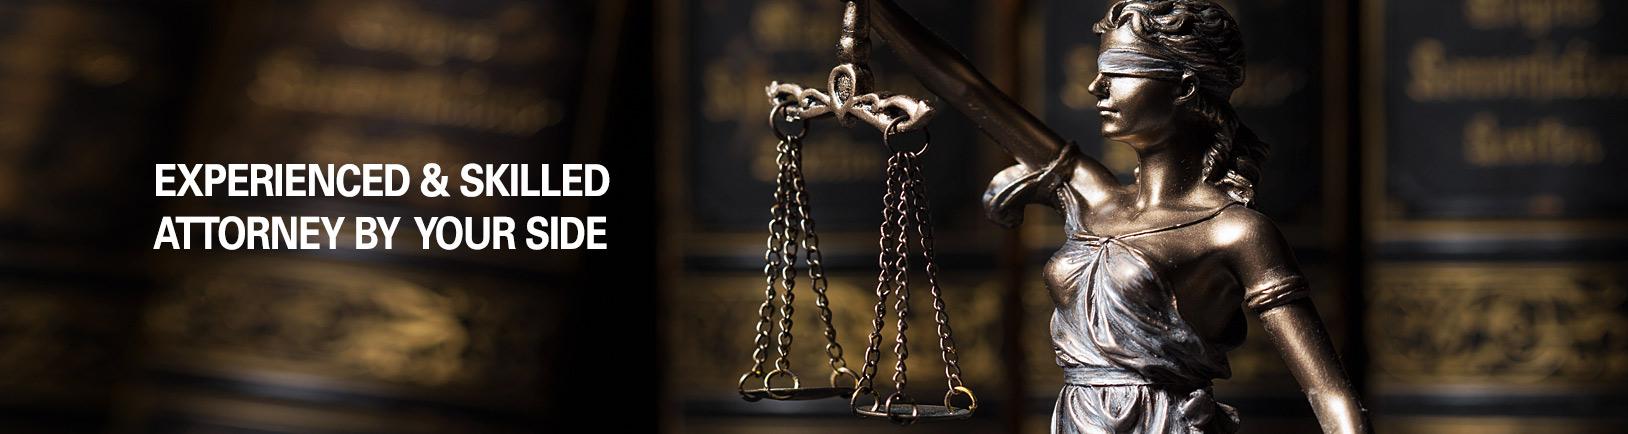 Belah-Hamideh-Law-Hero-Image-English-1